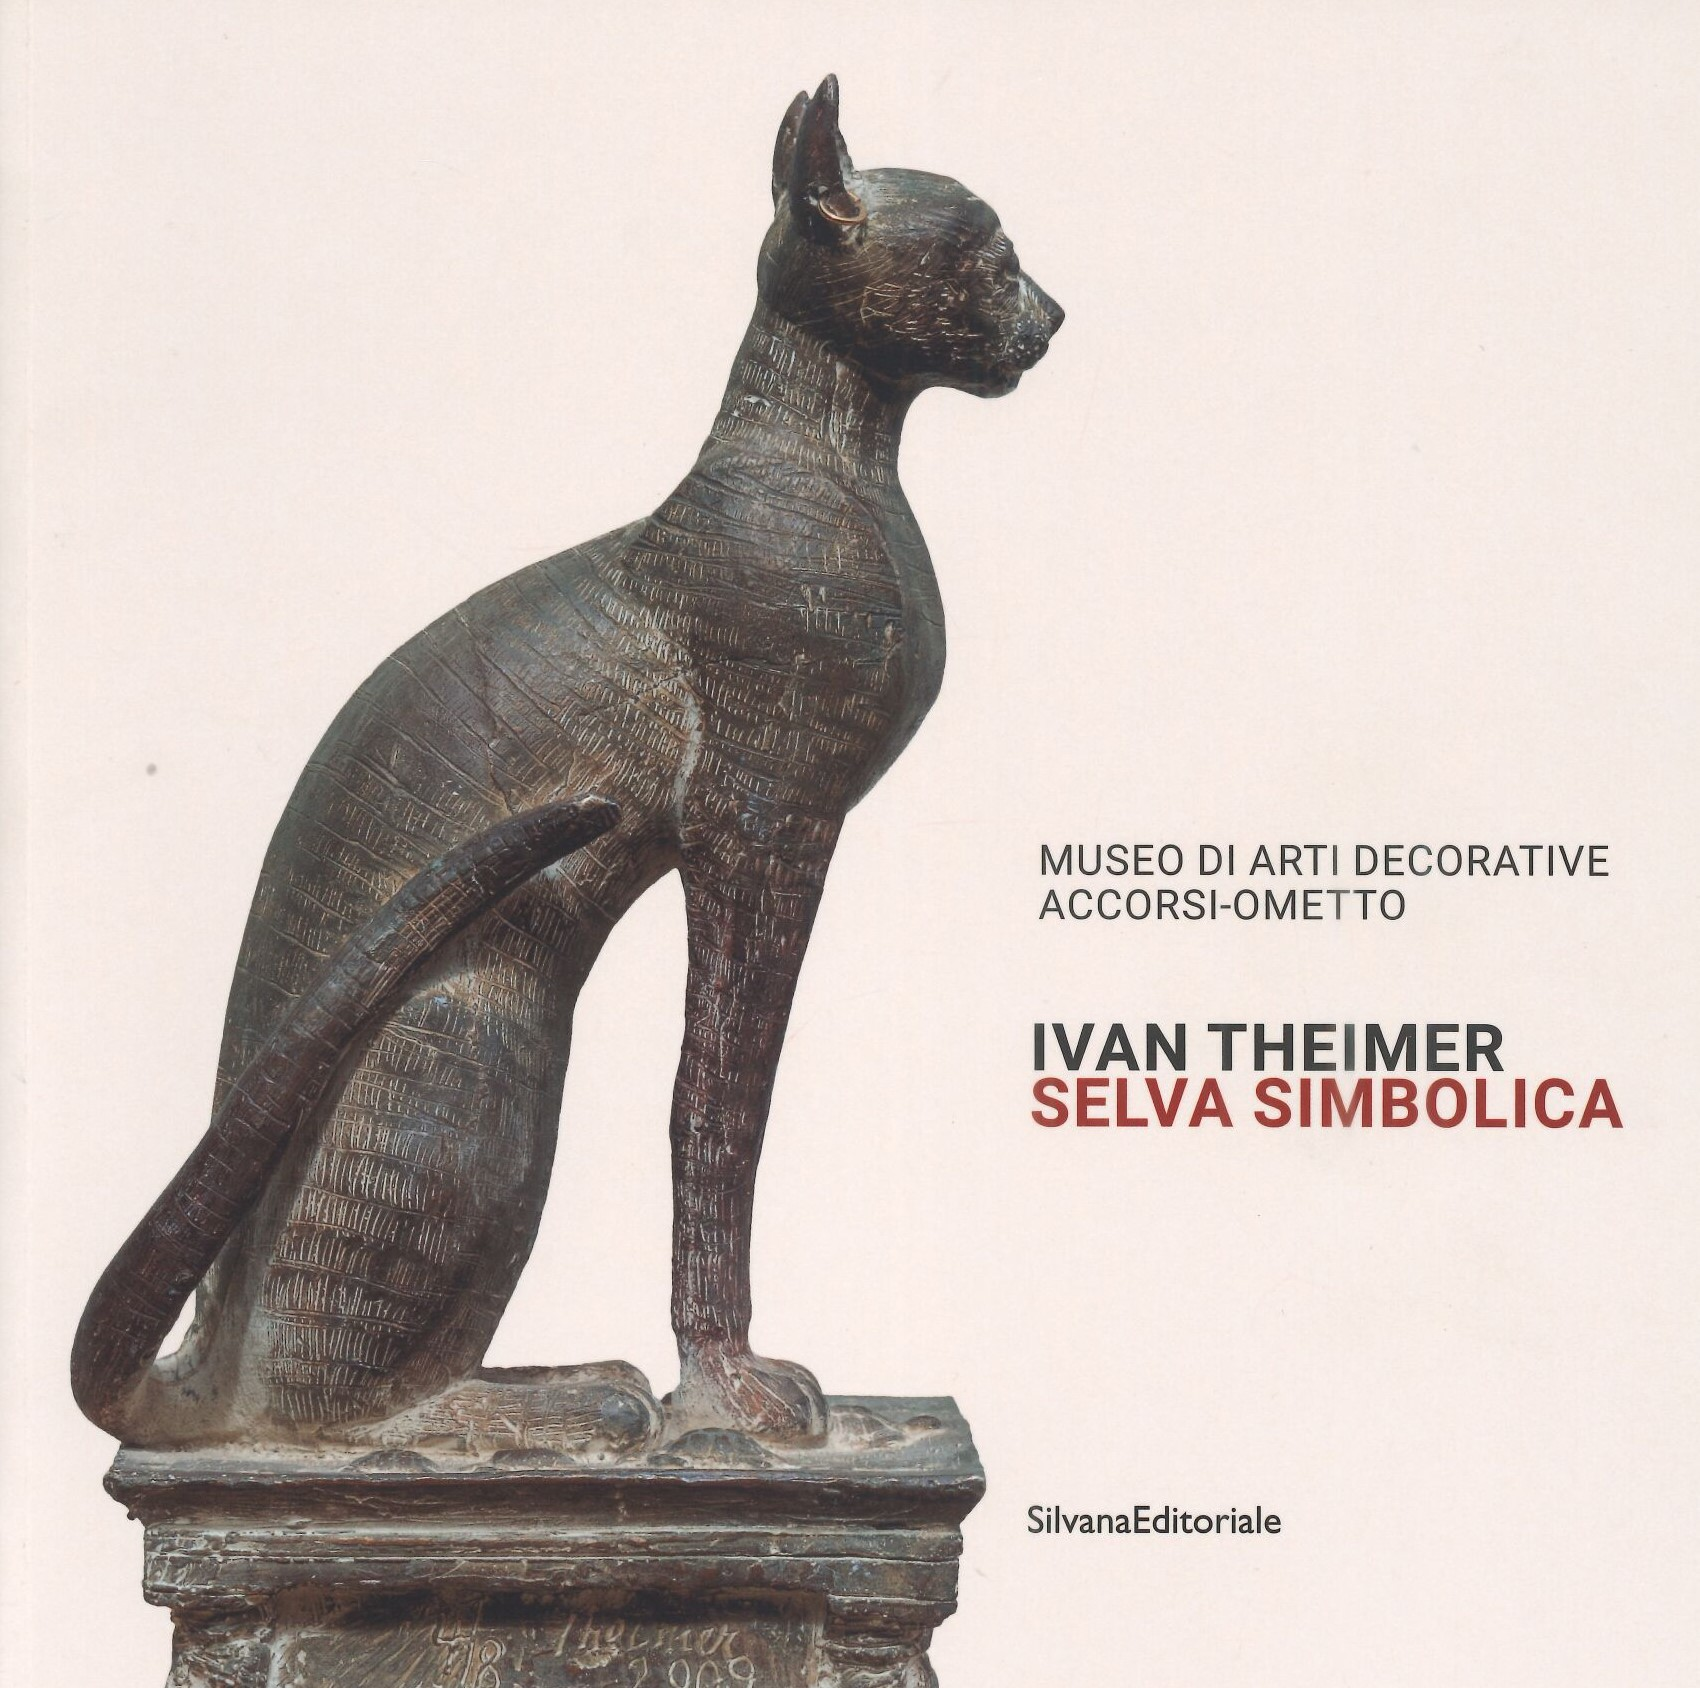 Ivan Theimer Selva simbolica